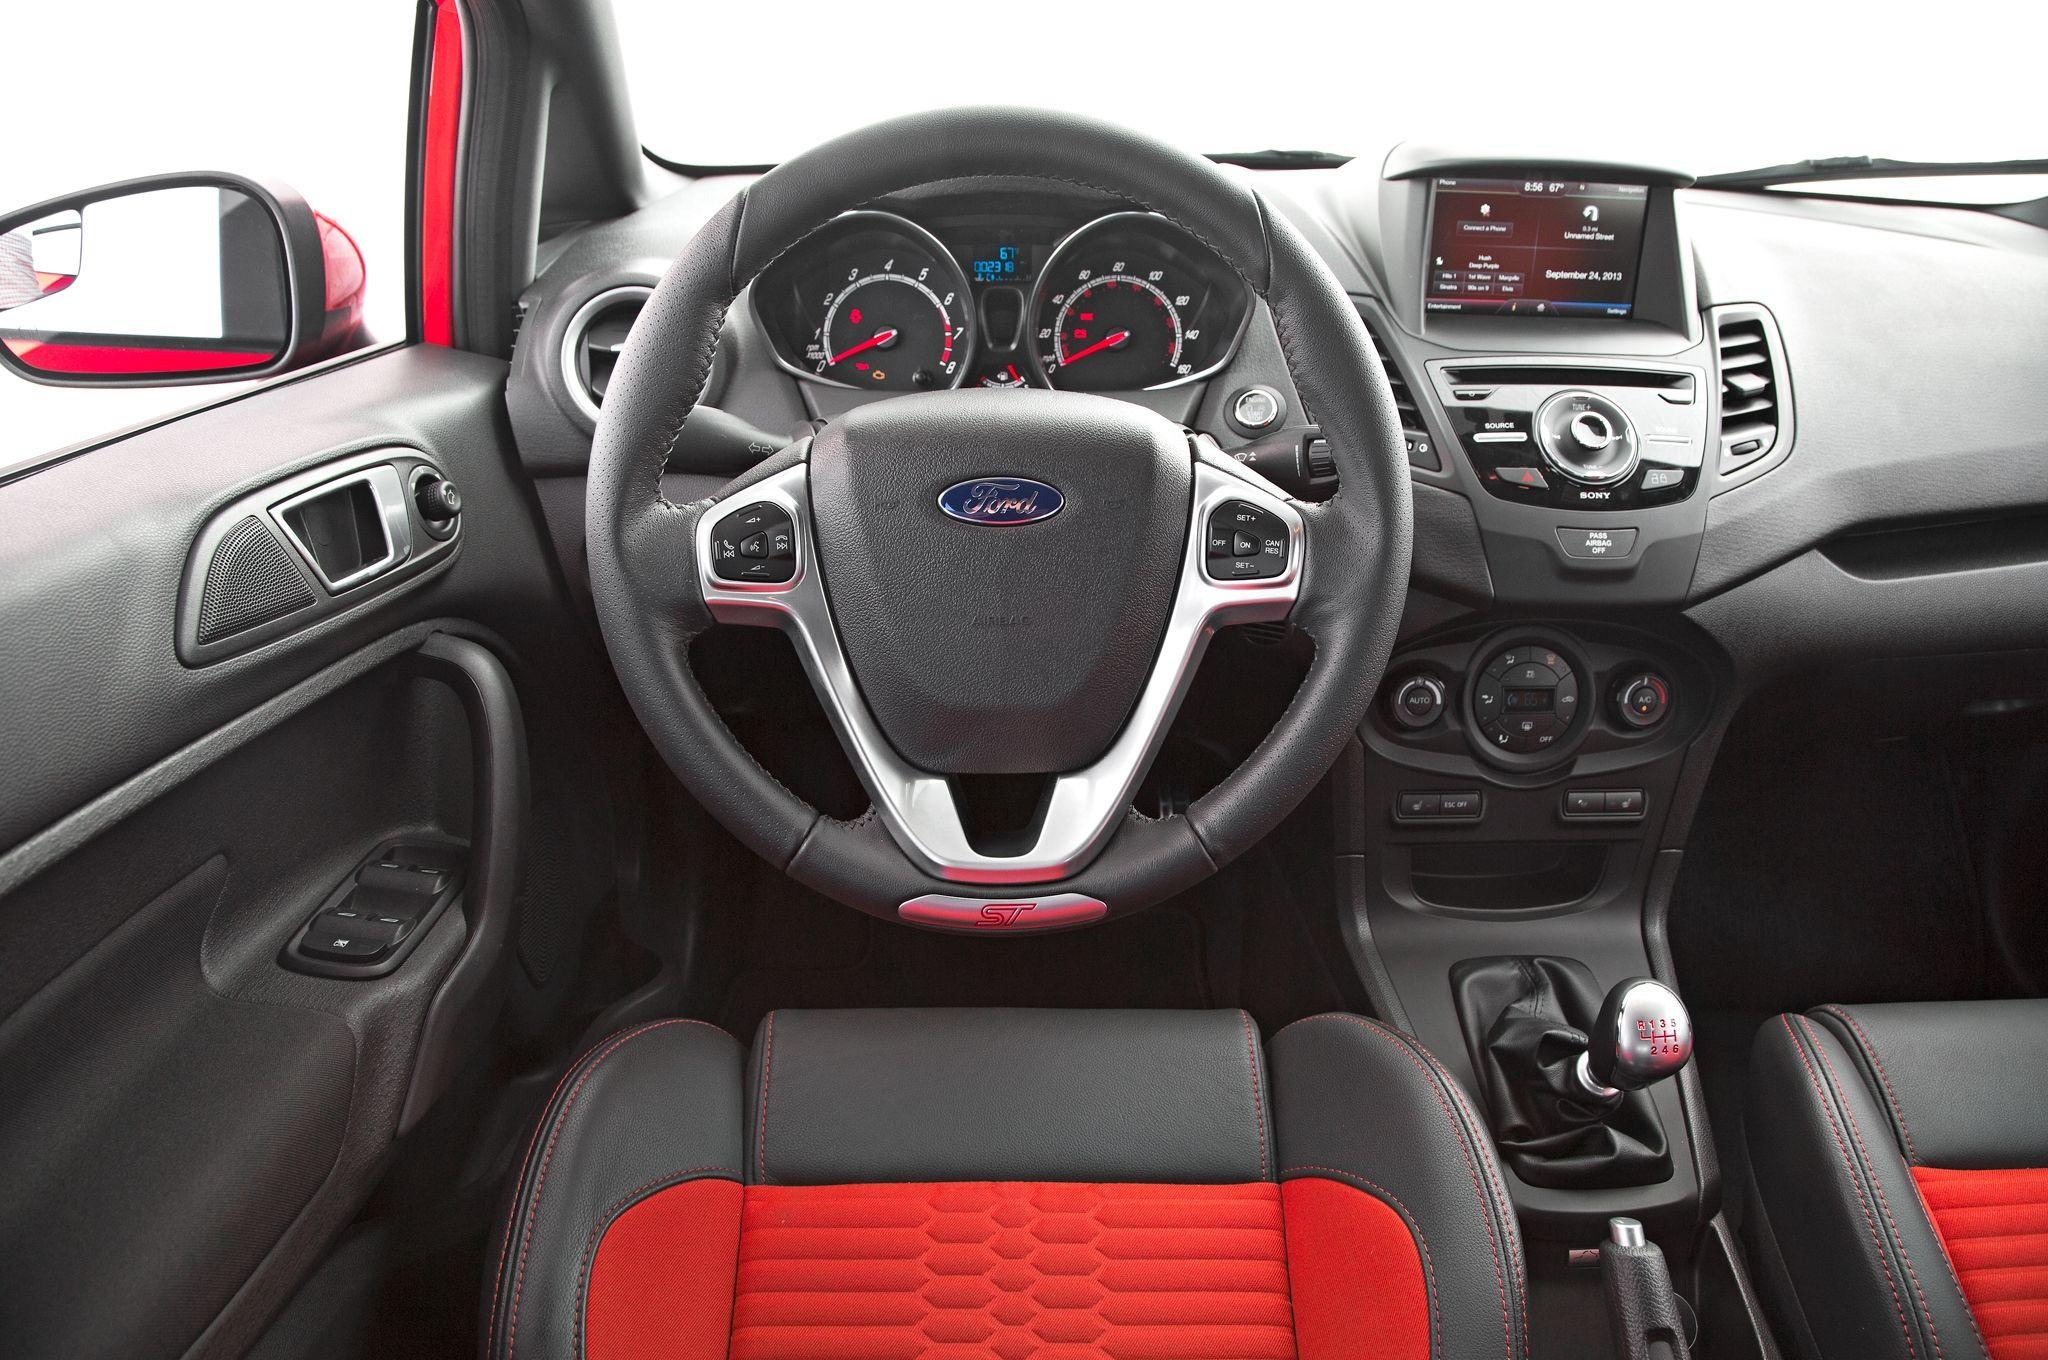 2014 ford fiesta st cockpit